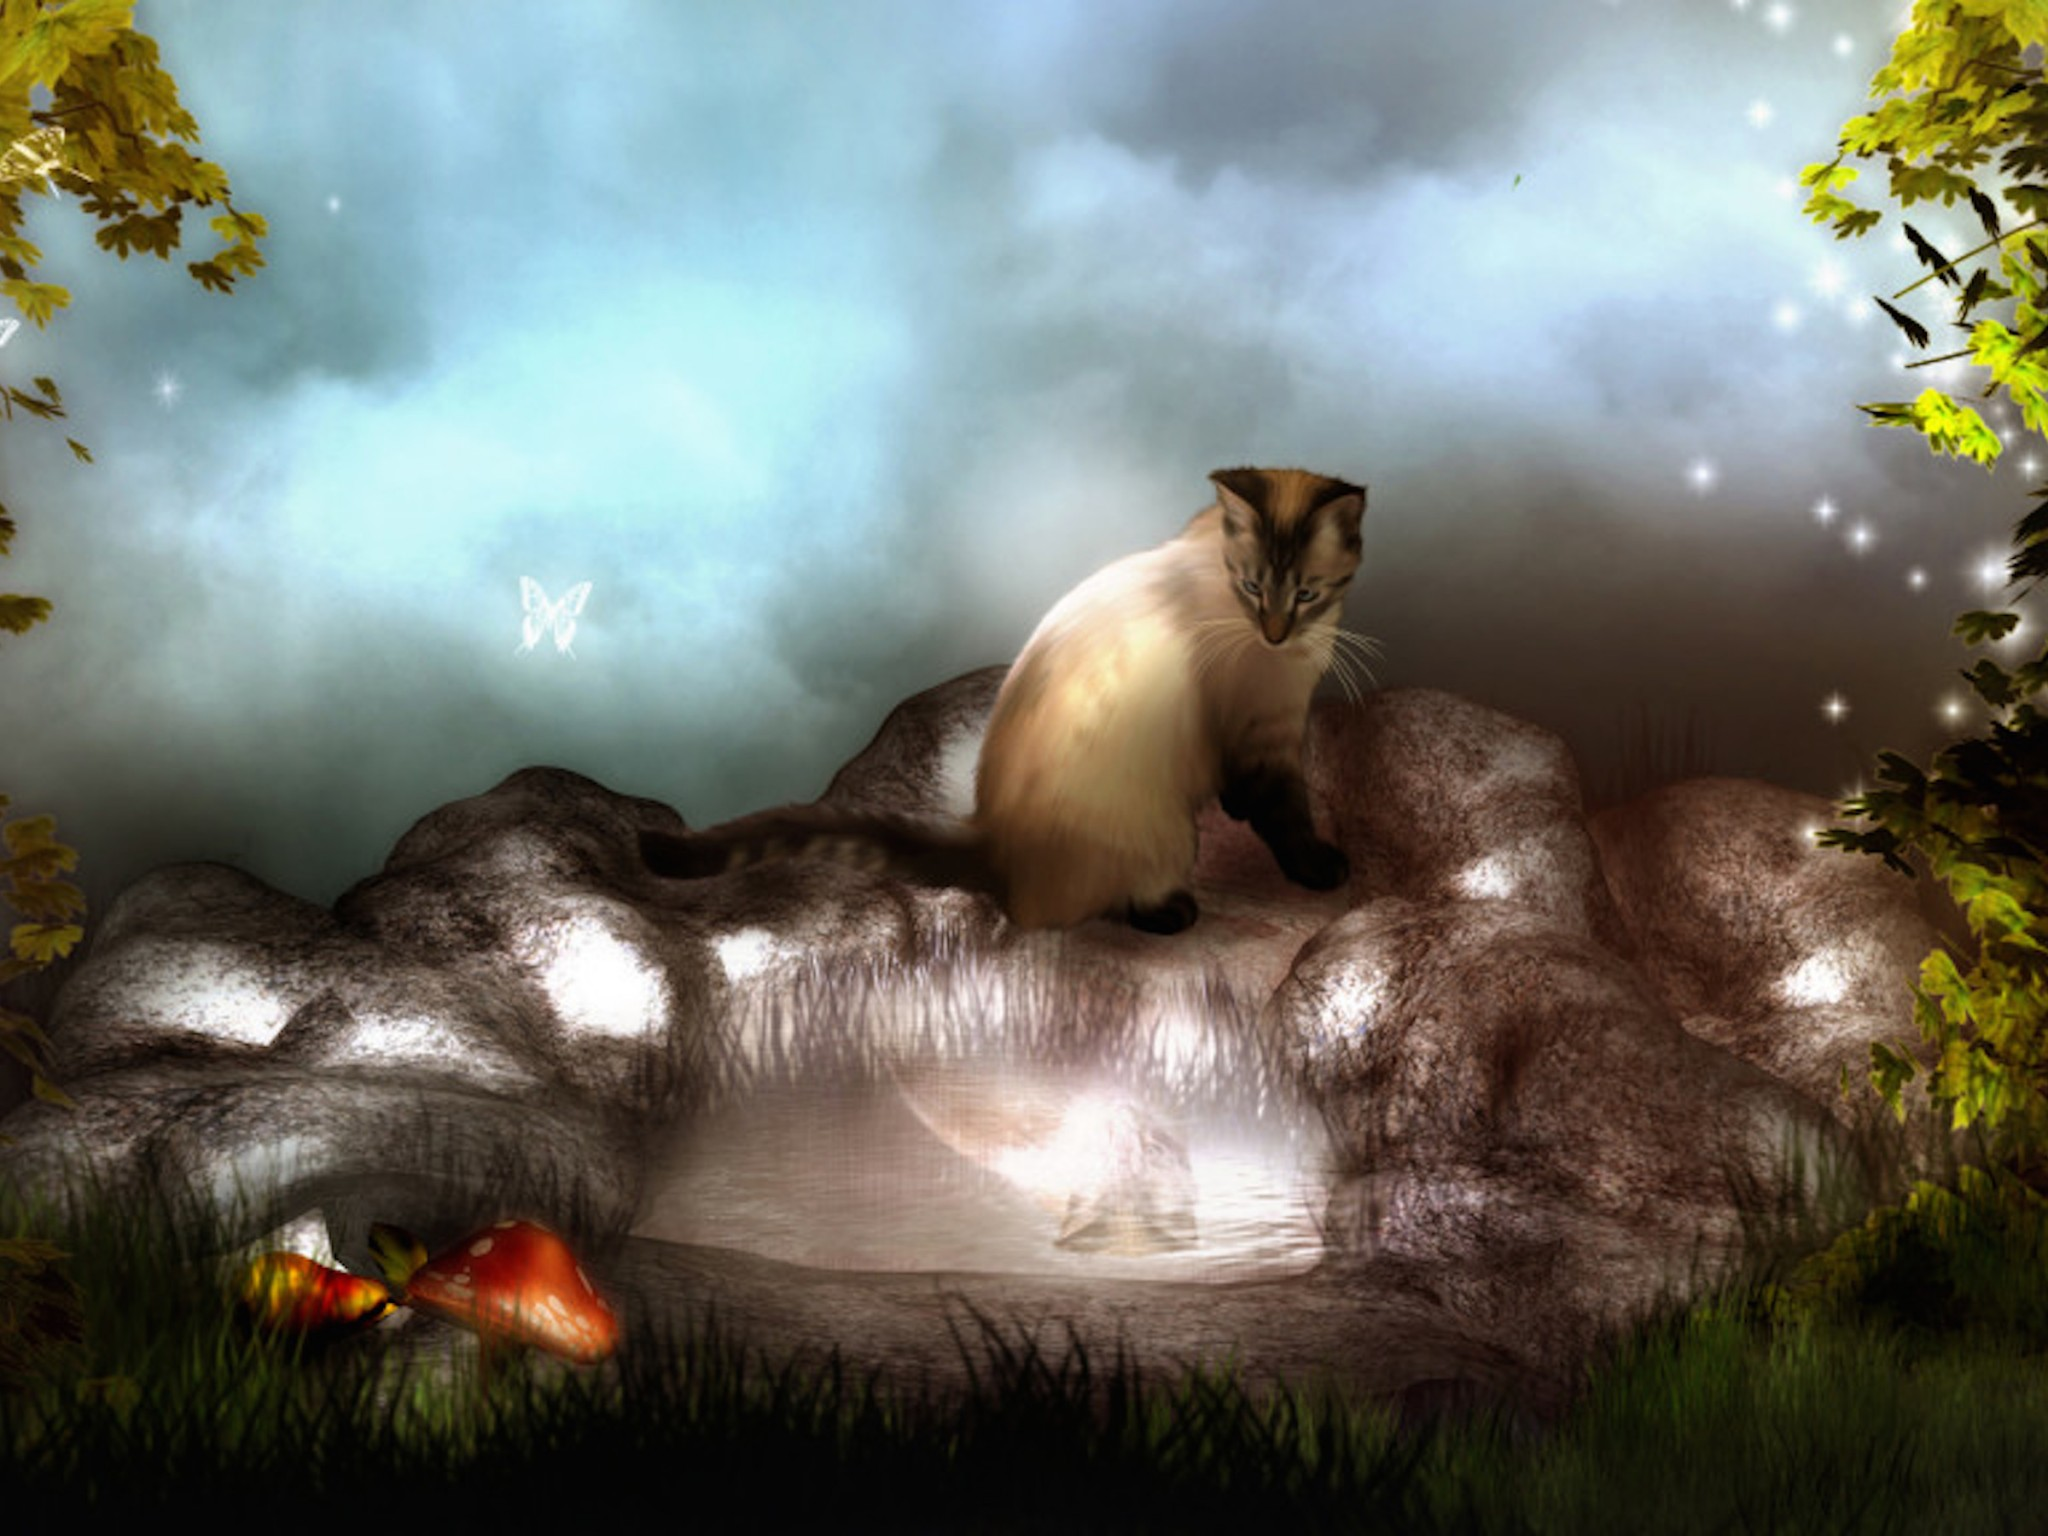 Cute Baby Wallpaper For Facebook Fantasy Cat Wallpaper Free Desktop Downloads